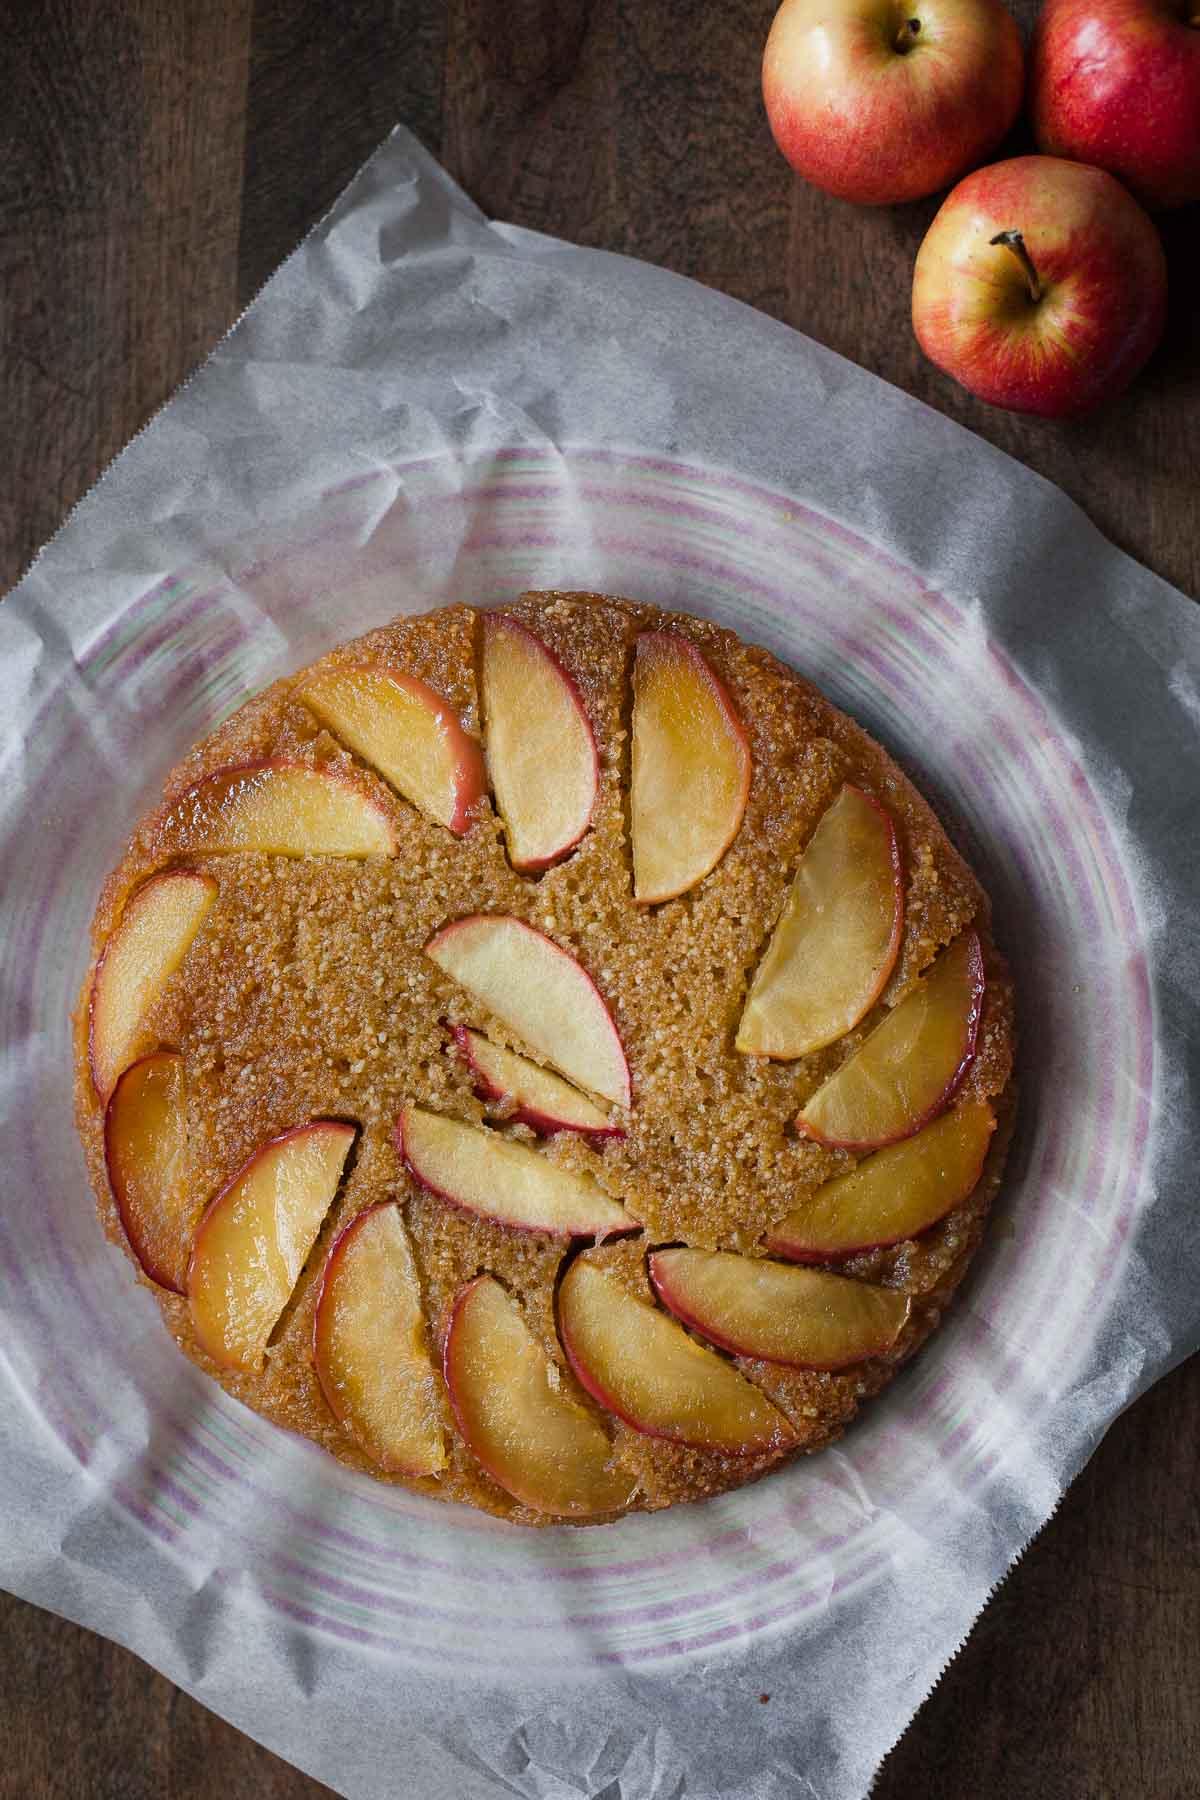 upside down cake warm apple cornmeal upside down cake upside down ...